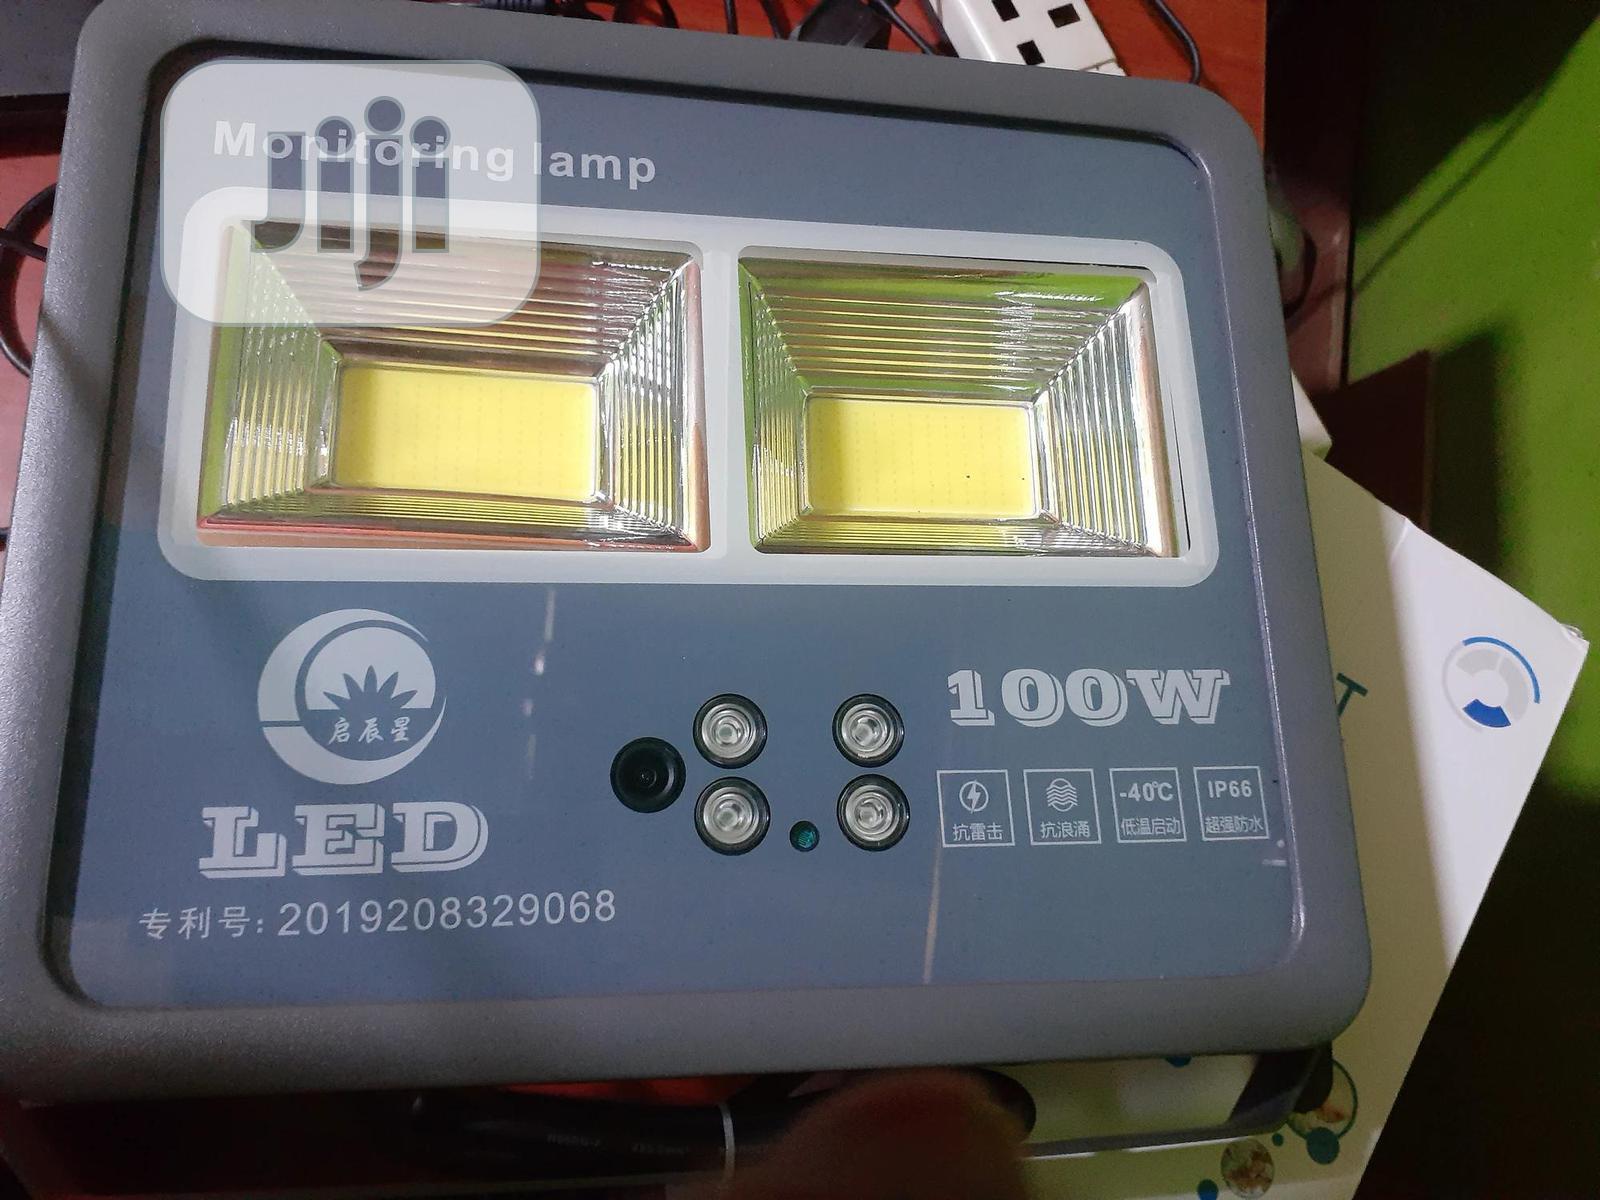 Wifi Wireless Led Lamp Monitoring Camera[64GB Inbuilt]